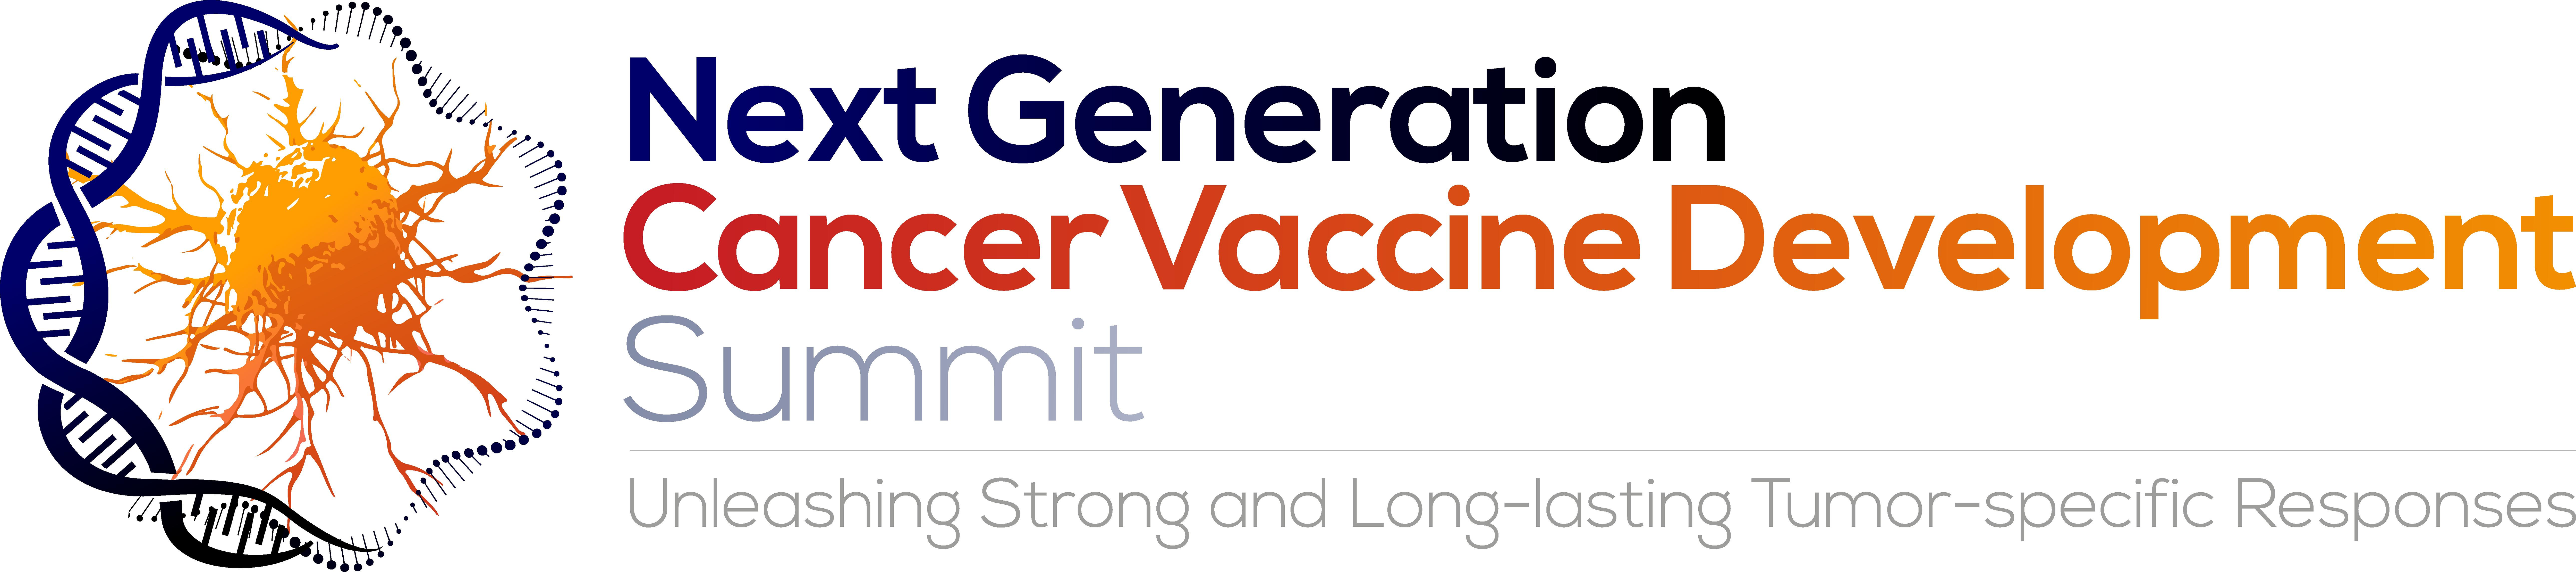 HW210128 23078 Next Generation Cancer Vaccine Development Summit logo v2 FINAL